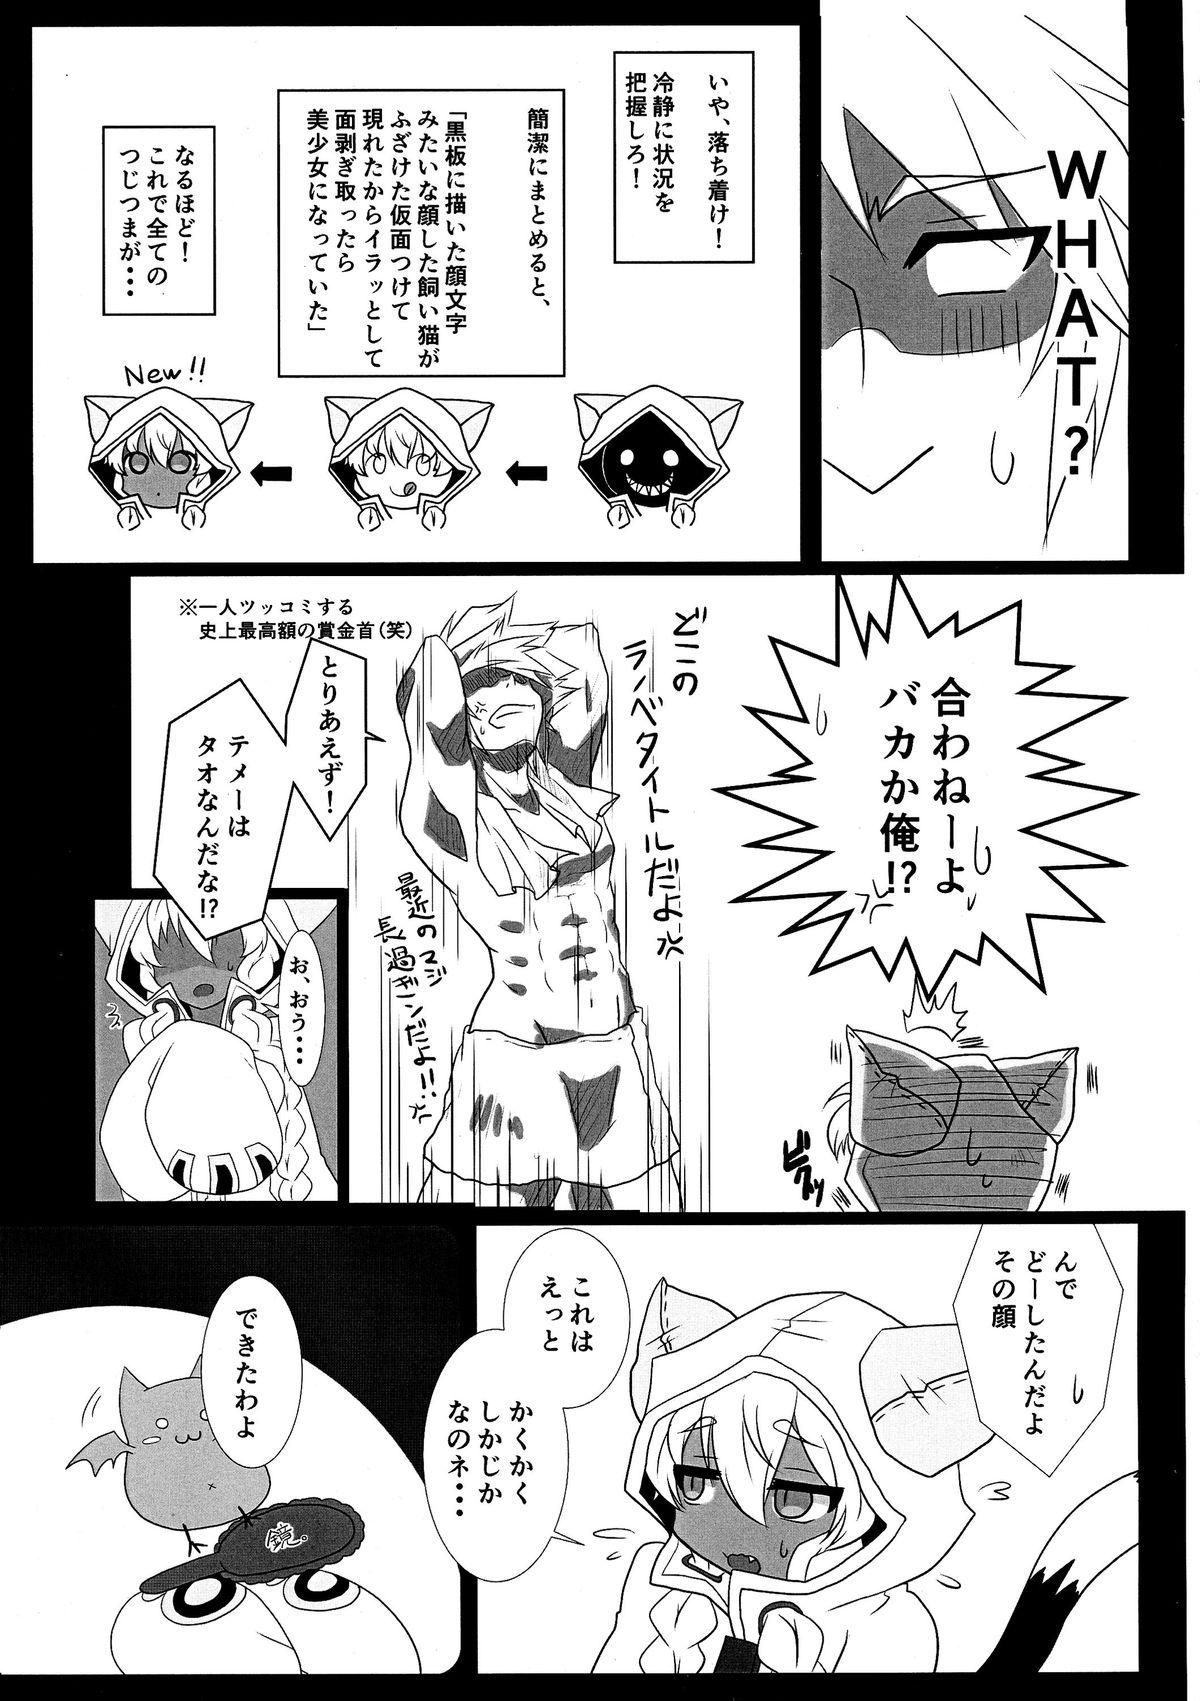 Tao no Ongaeshi 14